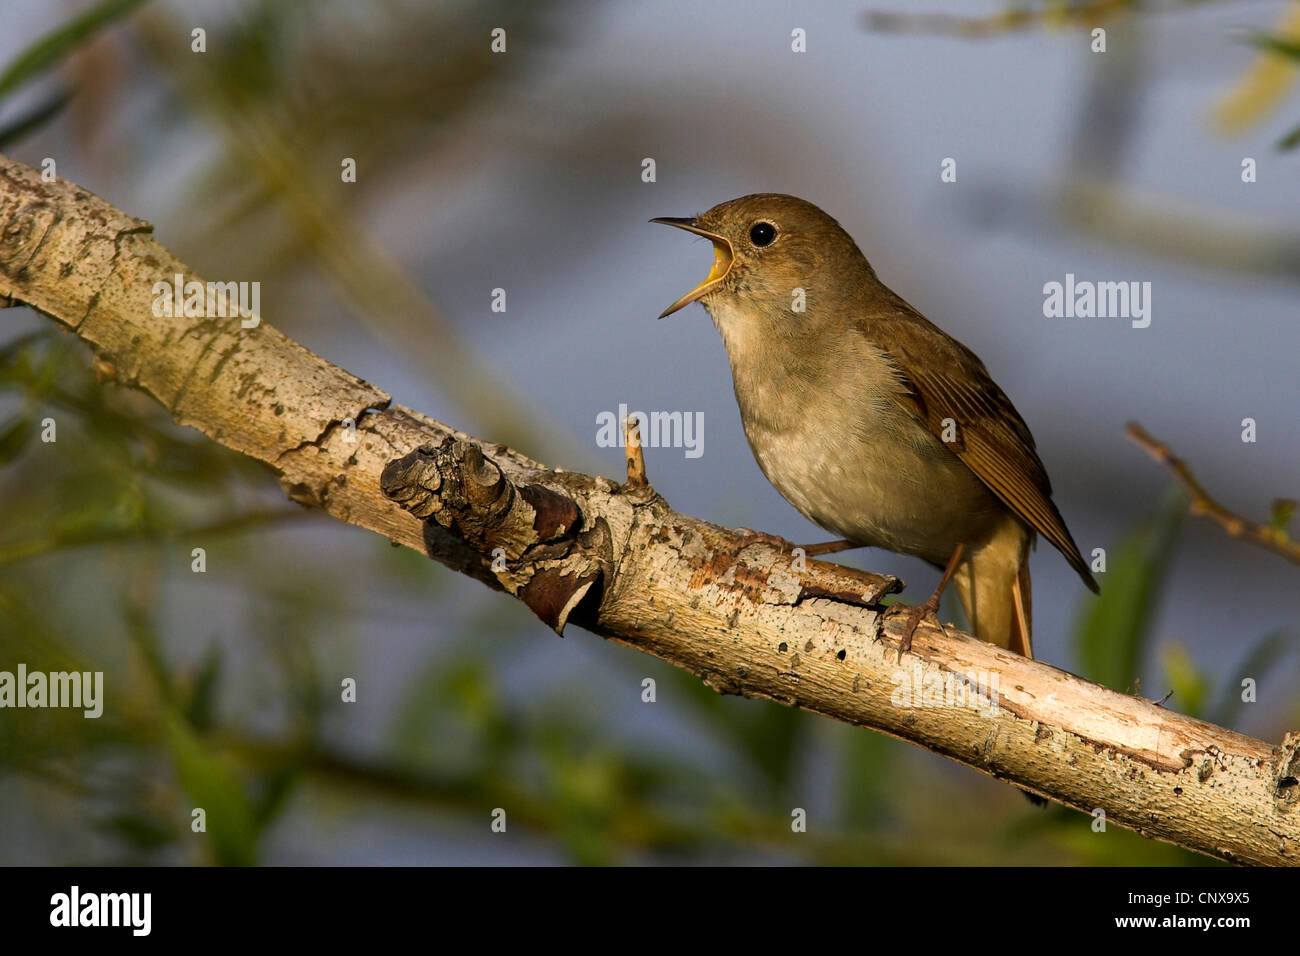 nightingale_Luscinia_megarhynchos_sittin